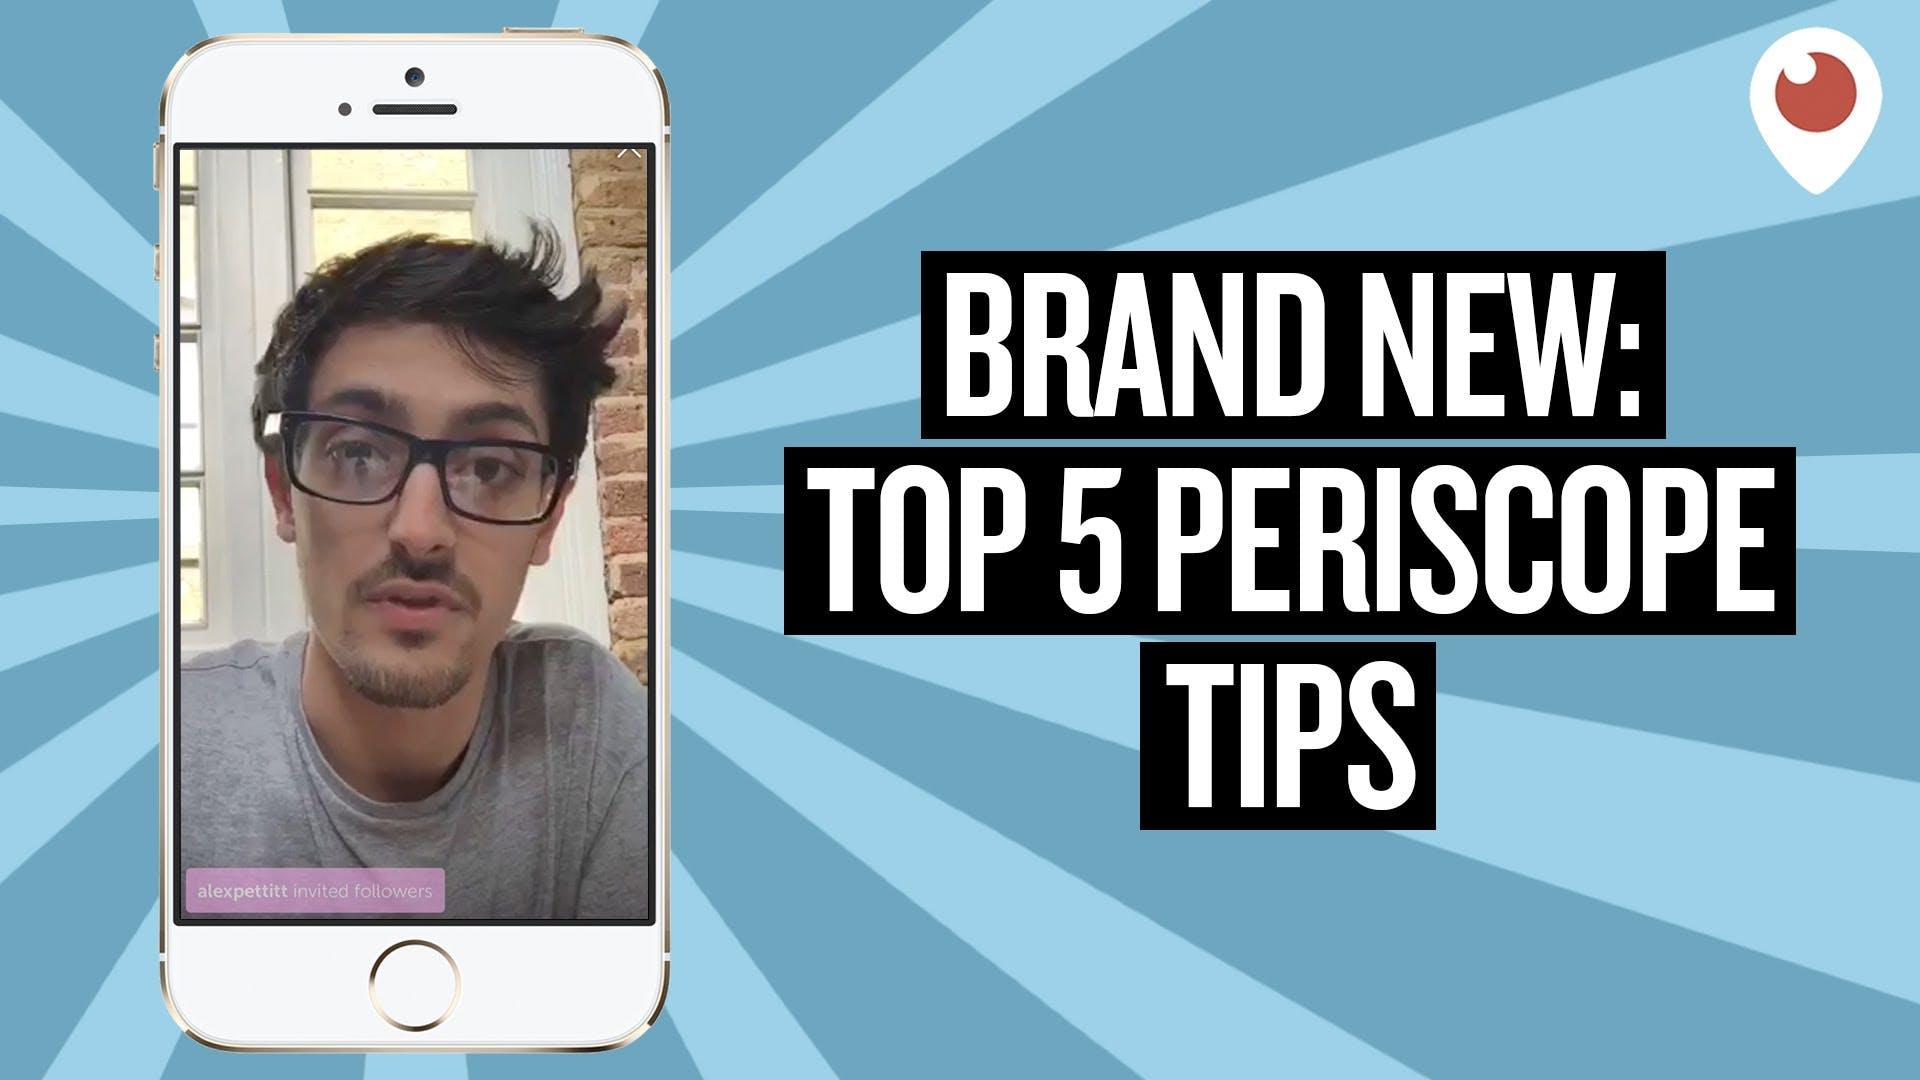 Live streaming expert and Periscope star Alex Pettitt runs top tips for brands